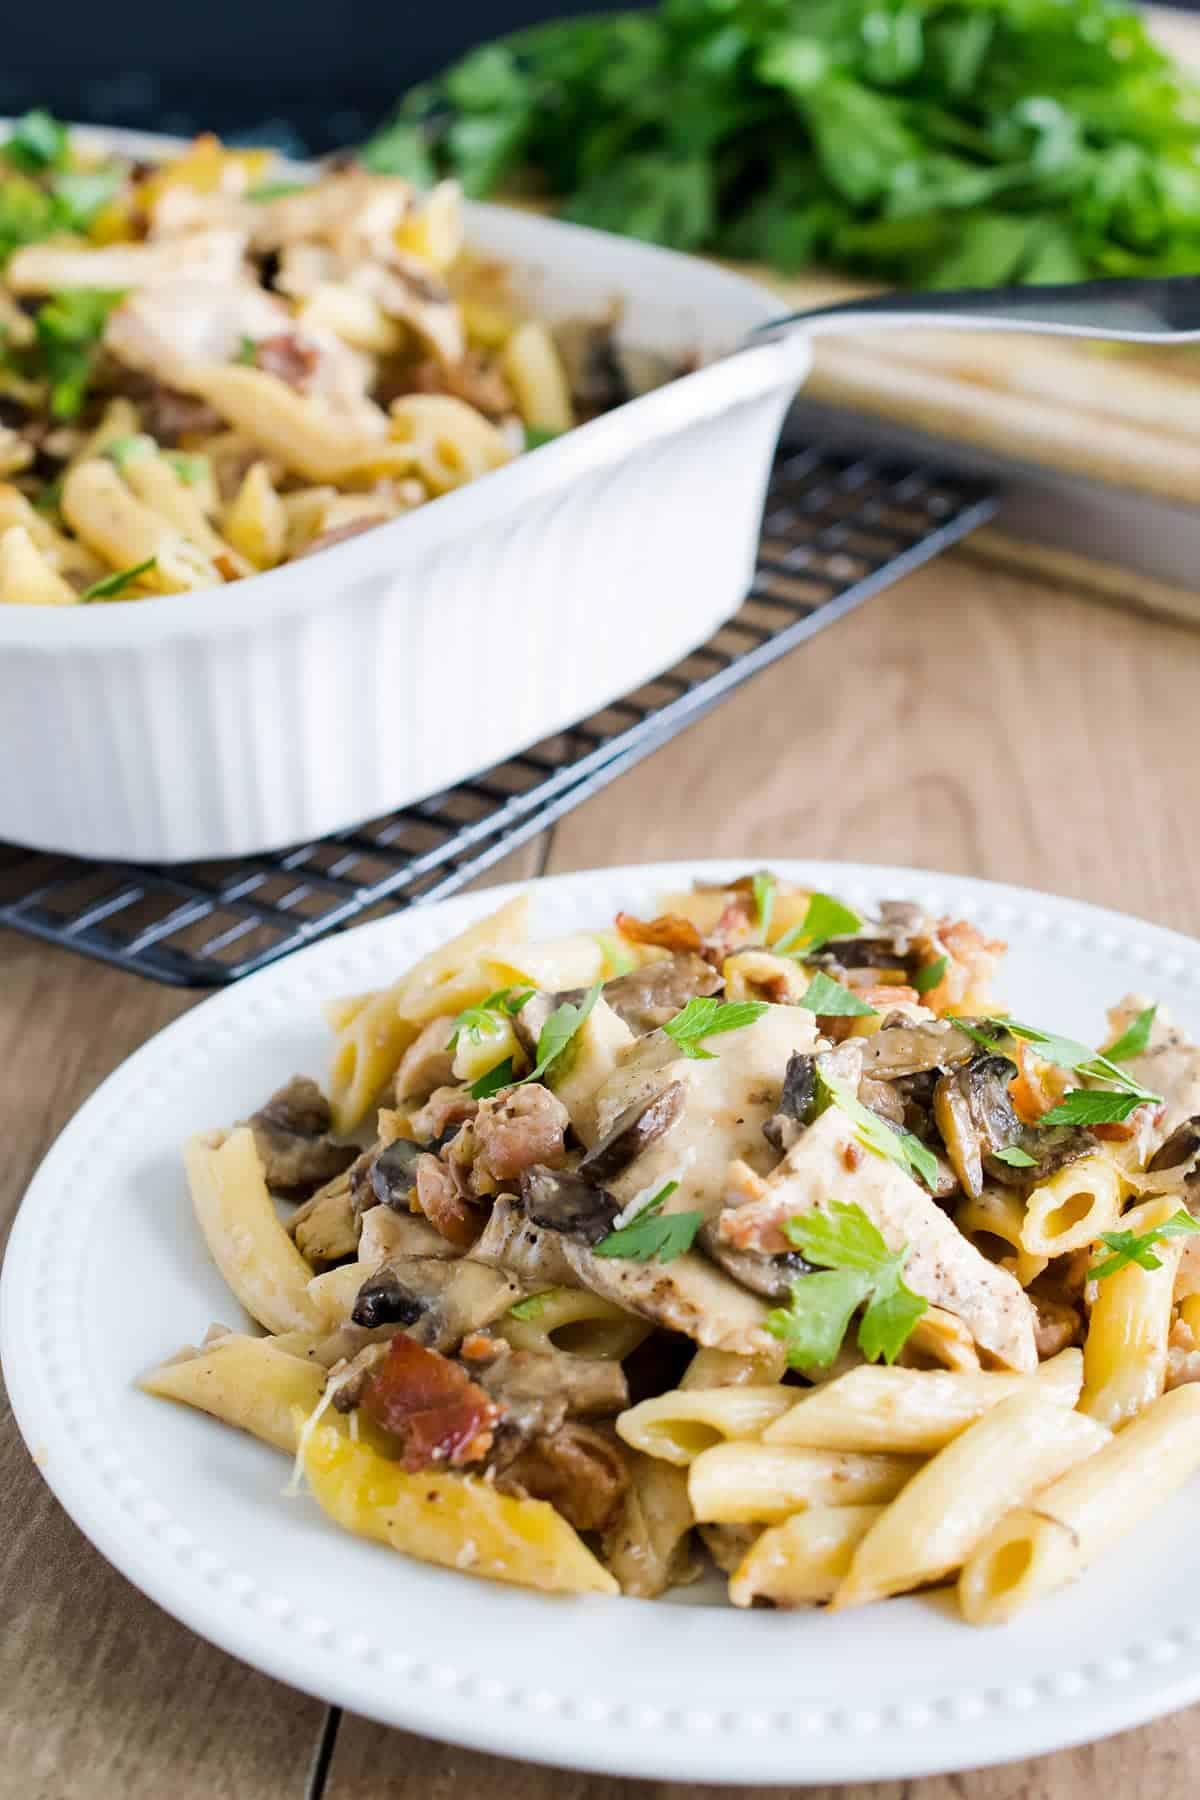 Chicken marsala pasta bake - mushrooms, prosciutto, and creamy Parmesan cheese sauce on white plate